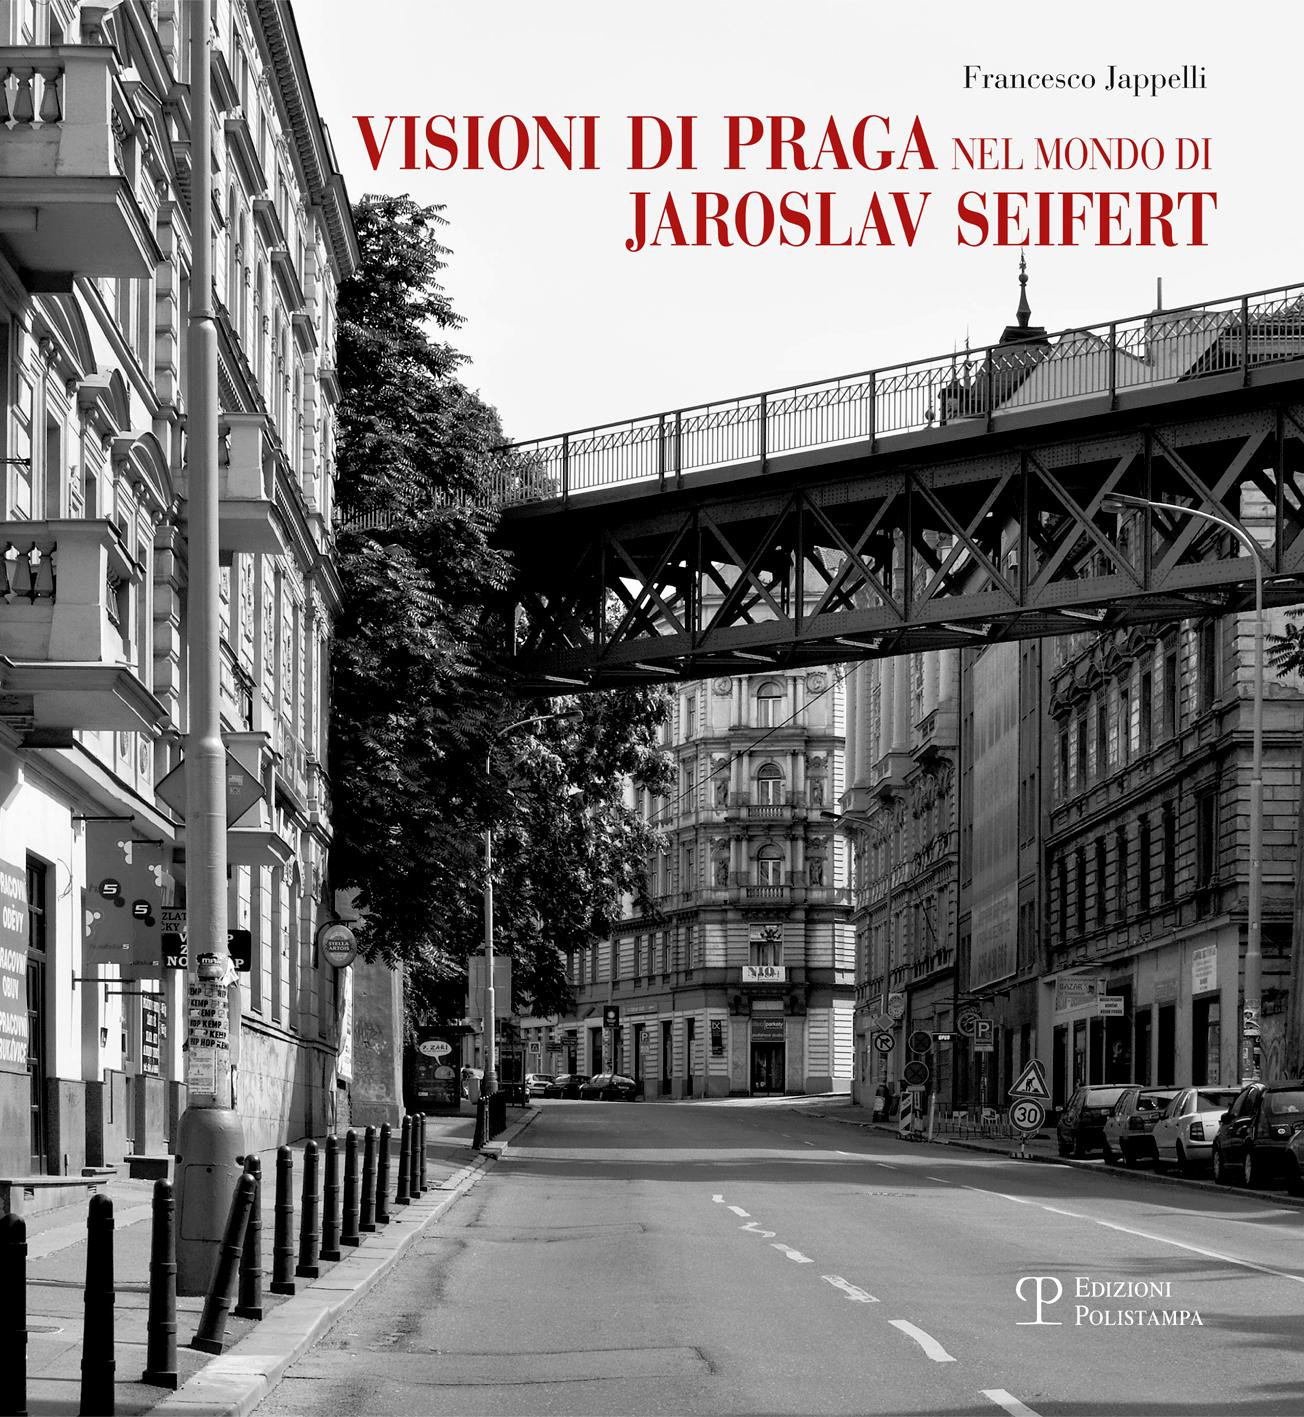 Francesco Jappelli, Visioni di Praga nel mondo di Jaroslav Seifert.